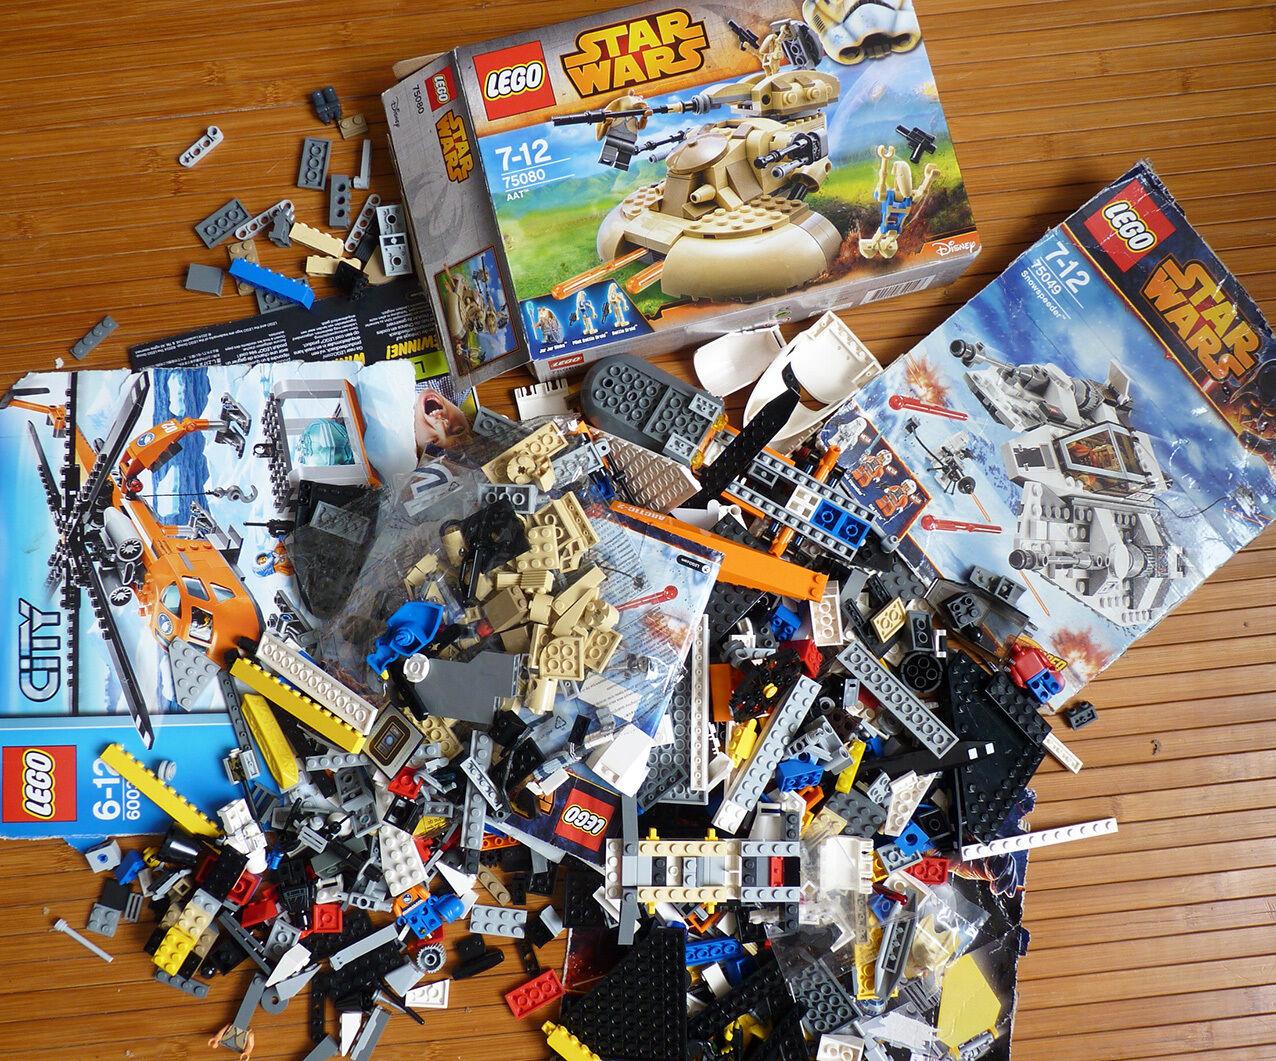 Groß Los LEGO STAR WARS